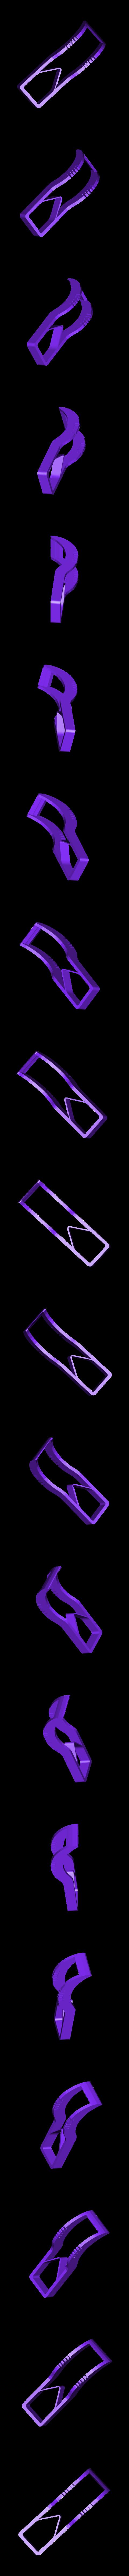 pince melon.stl Download STL file watermelon cutting pliers • 3D printer template, YOHAN_3D